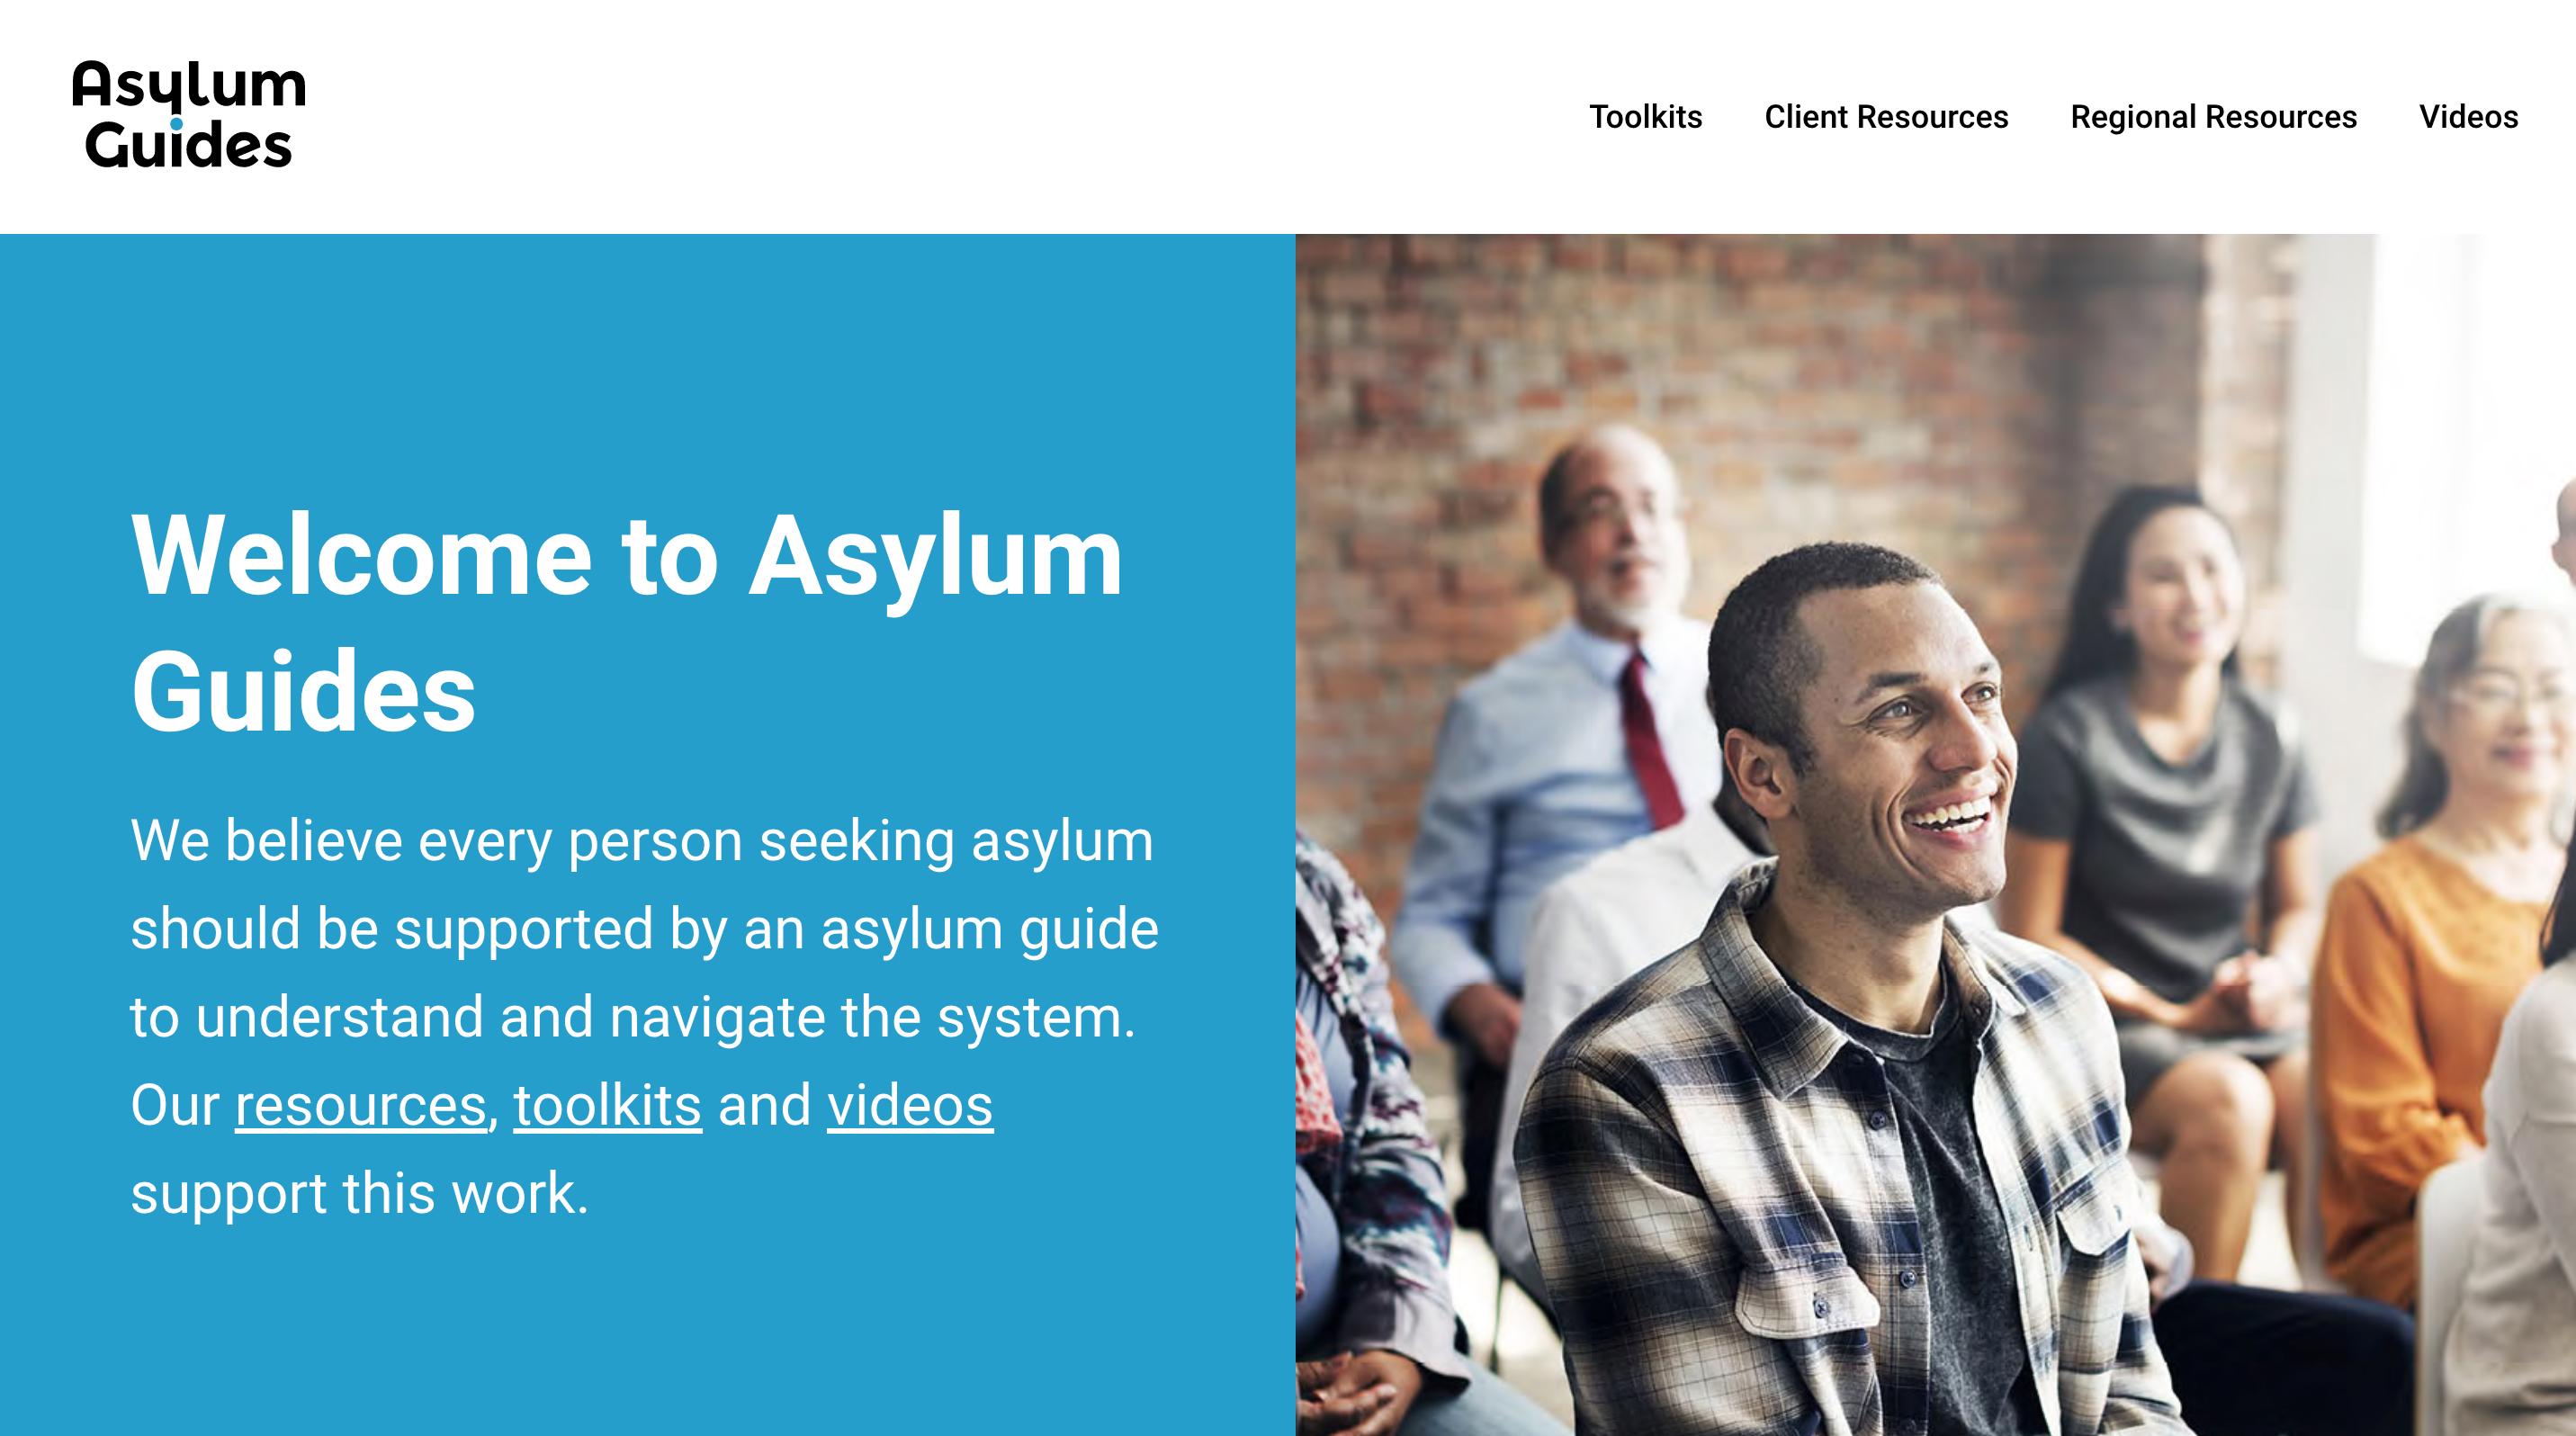 Asylum Guides